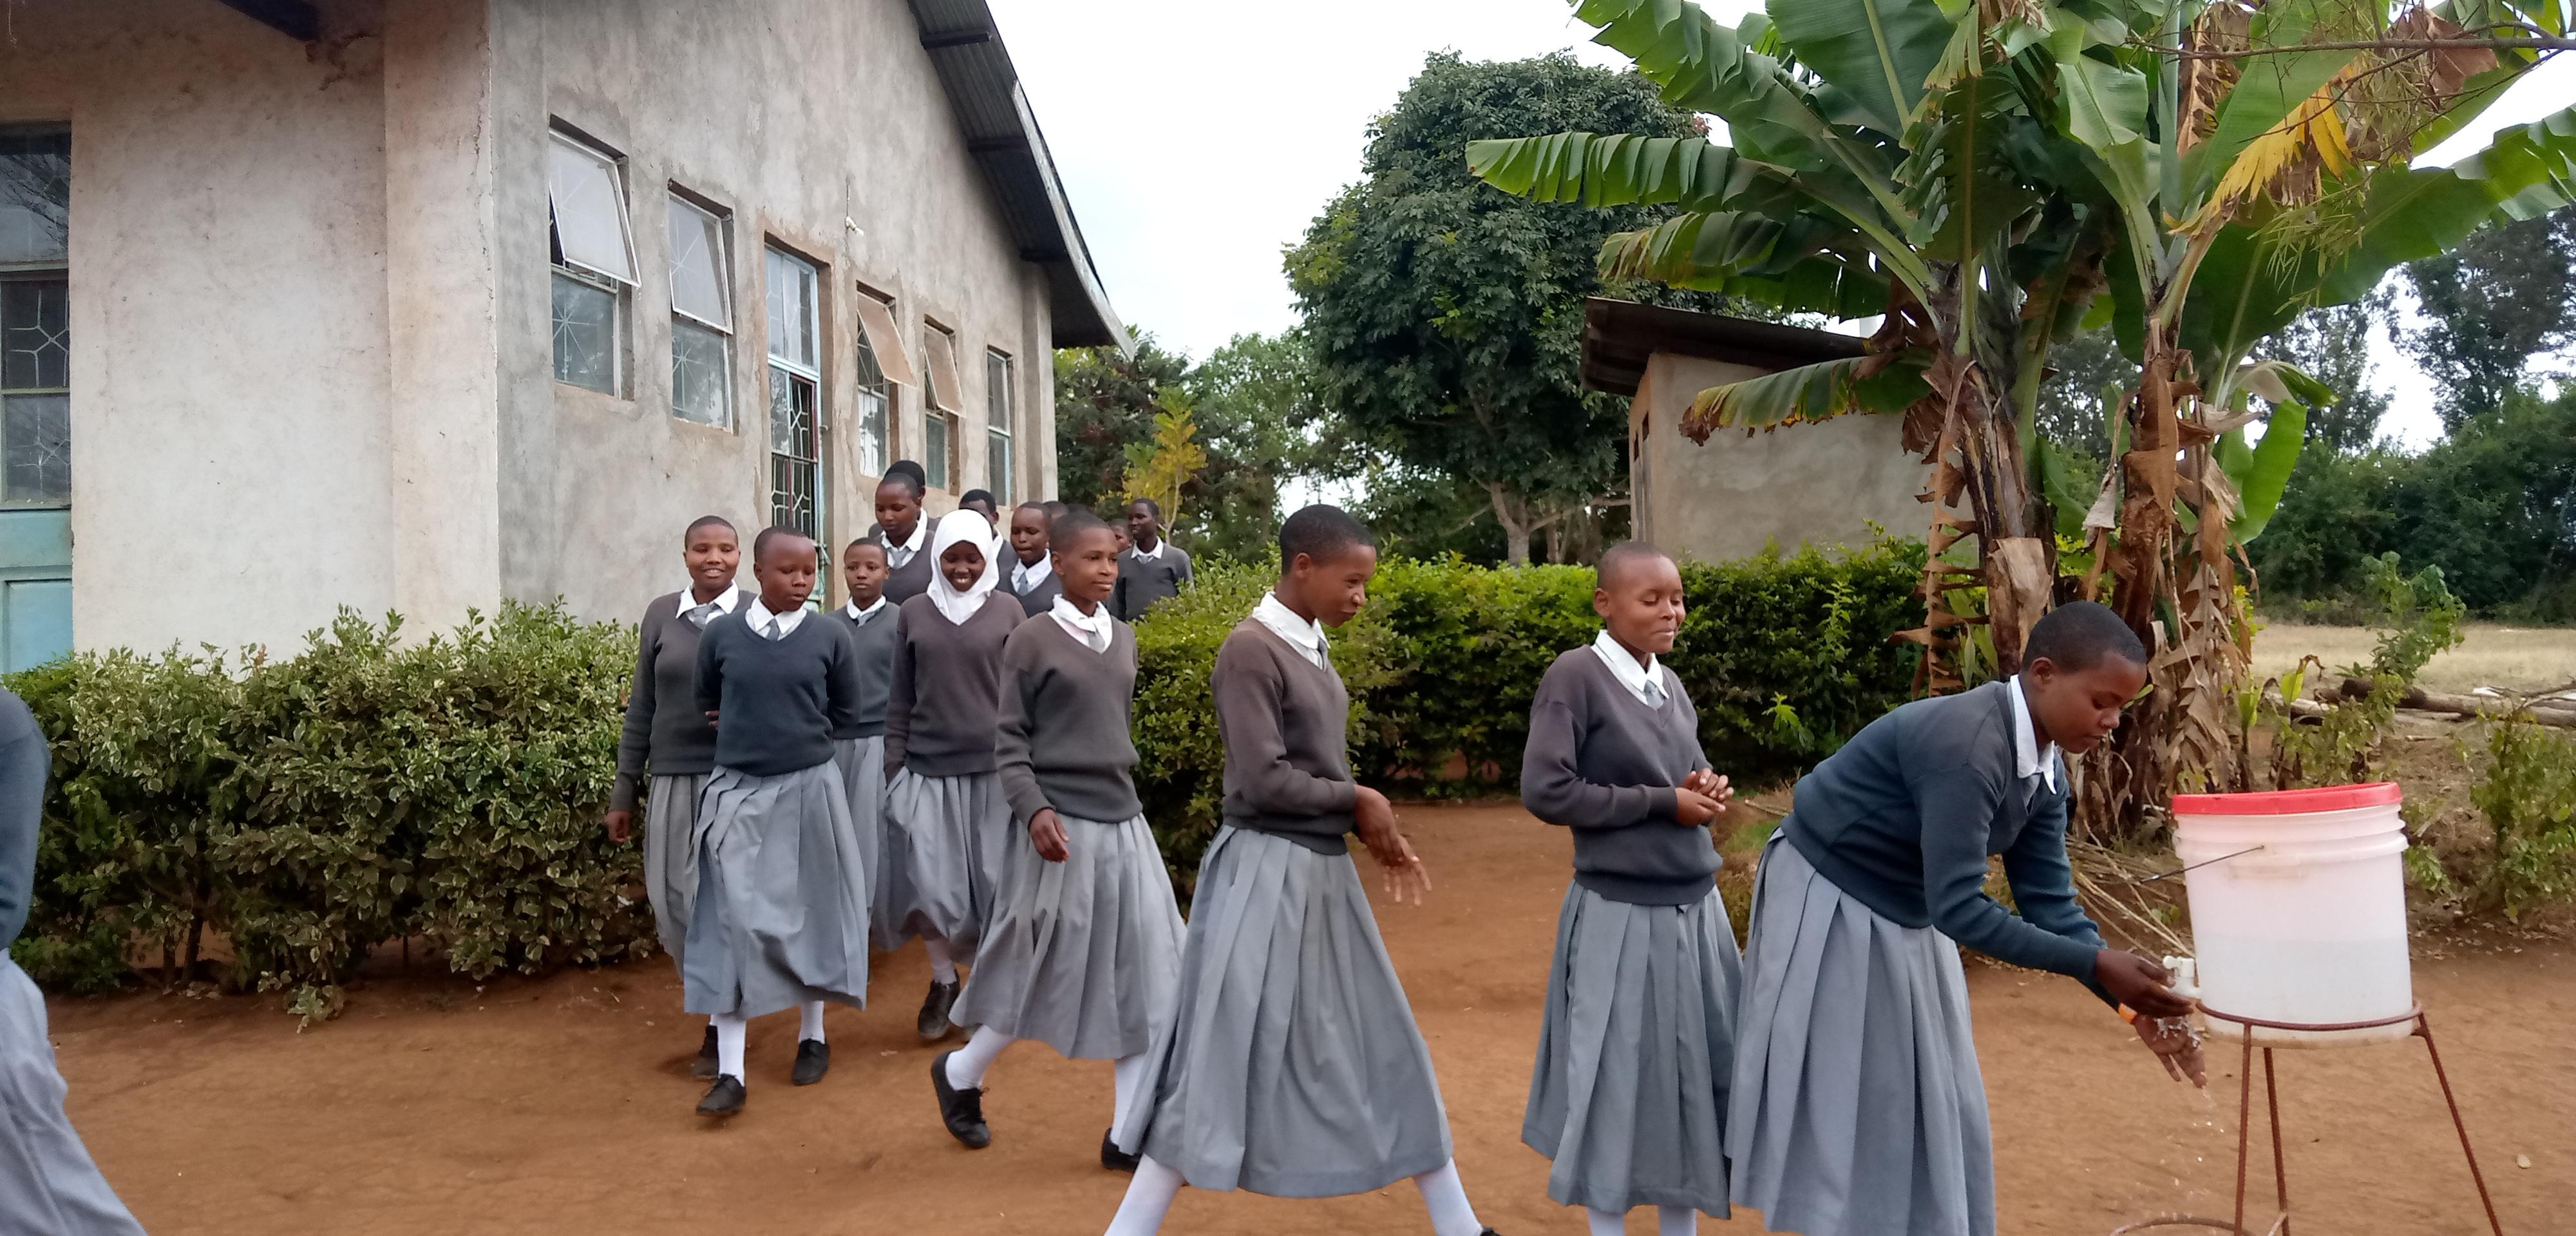 6.31 - Project 2021 - Tsaayho Secondary bathrooms - Students washing hands after bathroom use 01.jpg